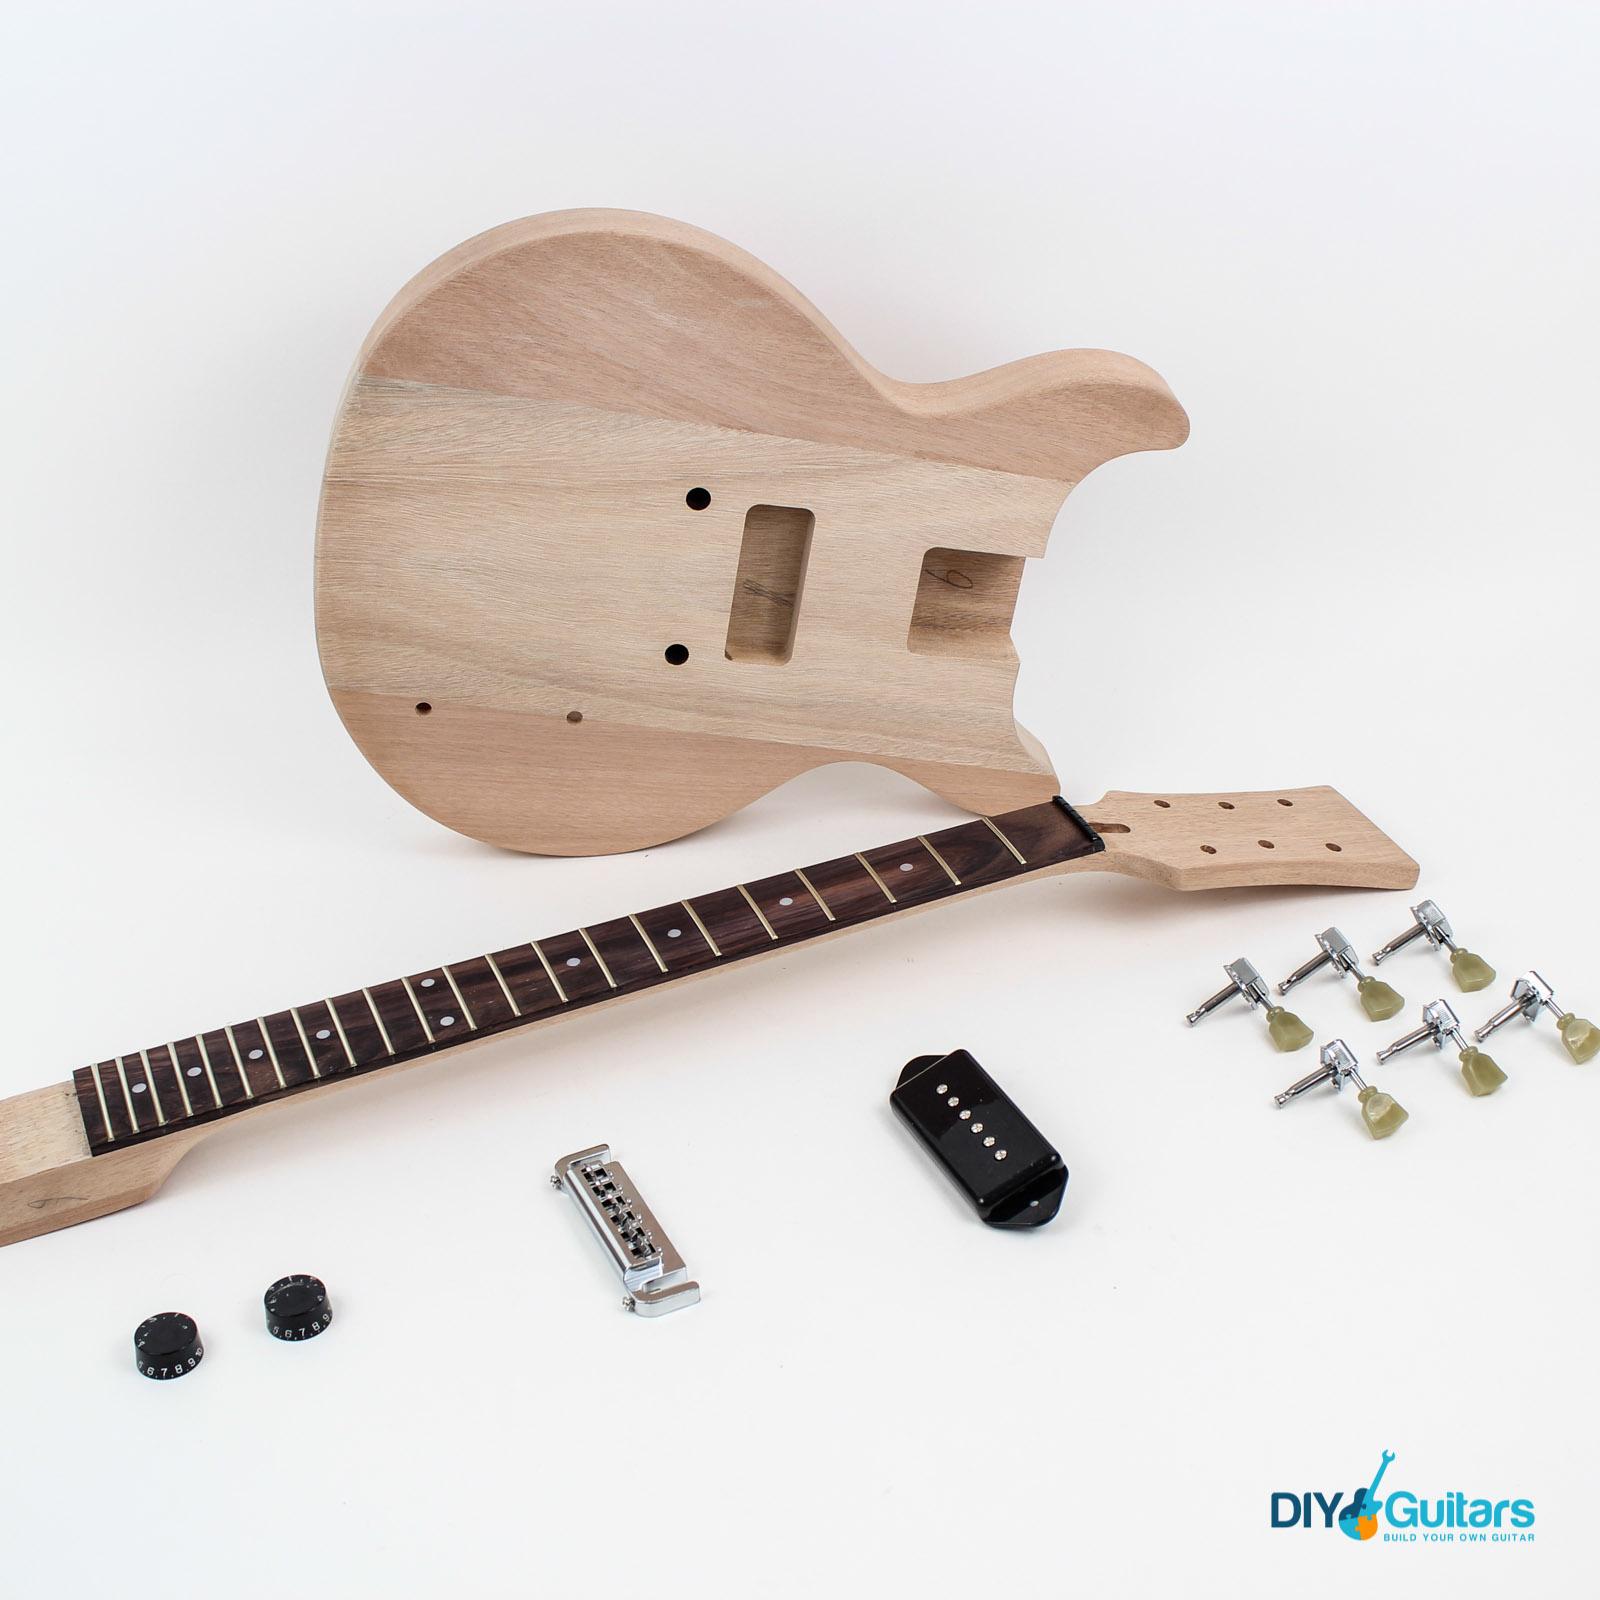 Gibson Les Paul JR Style Double Cutaway DIY Guitar Kit